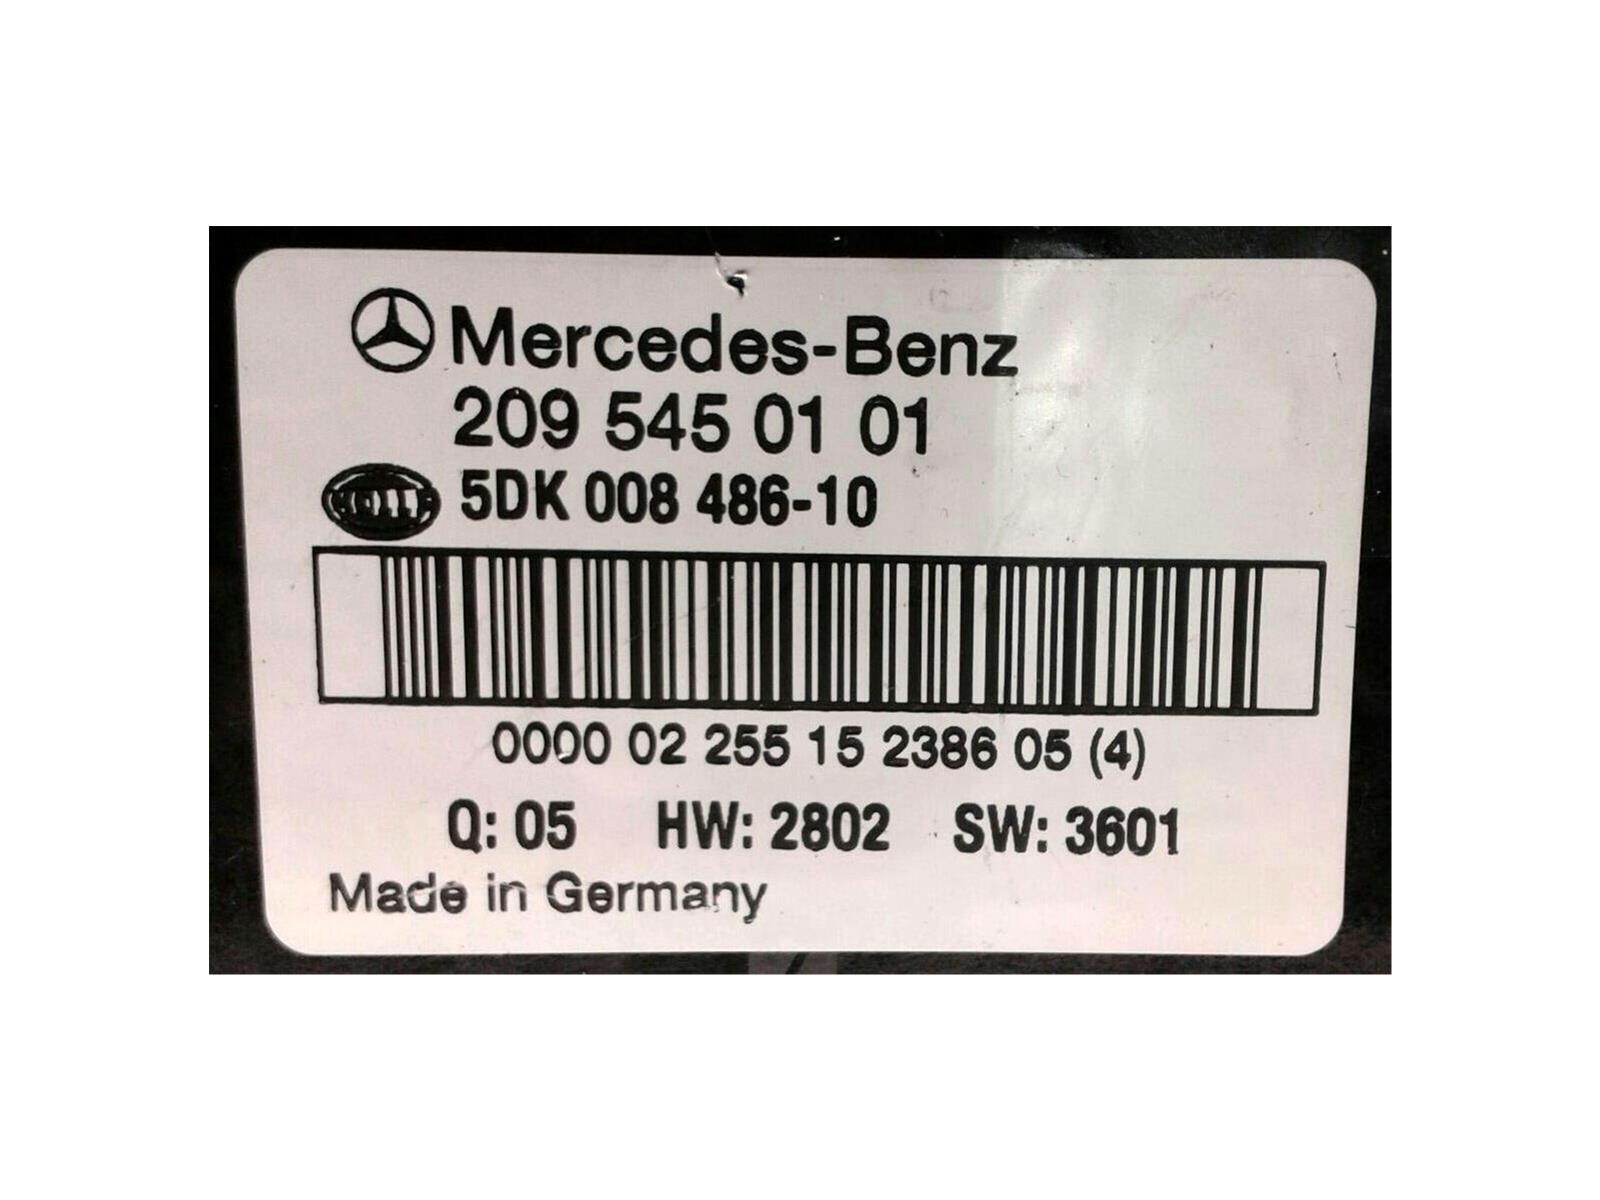 Mercedesbenz C Class 2003 To 2008 Ecu Engine Diesel Automatic Mercedes Benz Fuse Box Instruments 2007 C270